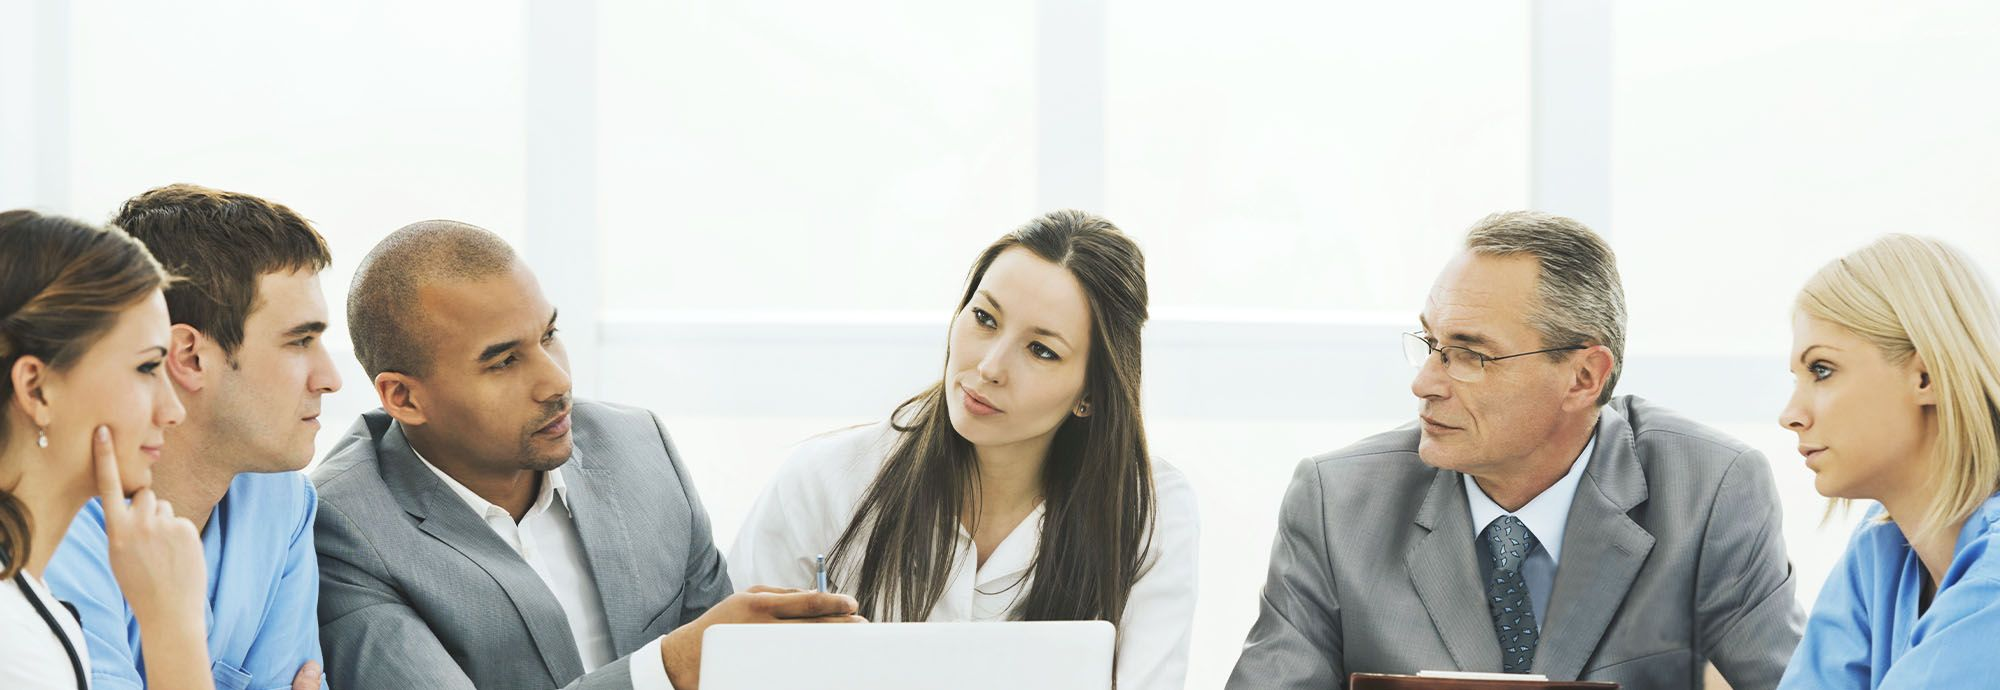 coperture assicurative medici altri professionisti